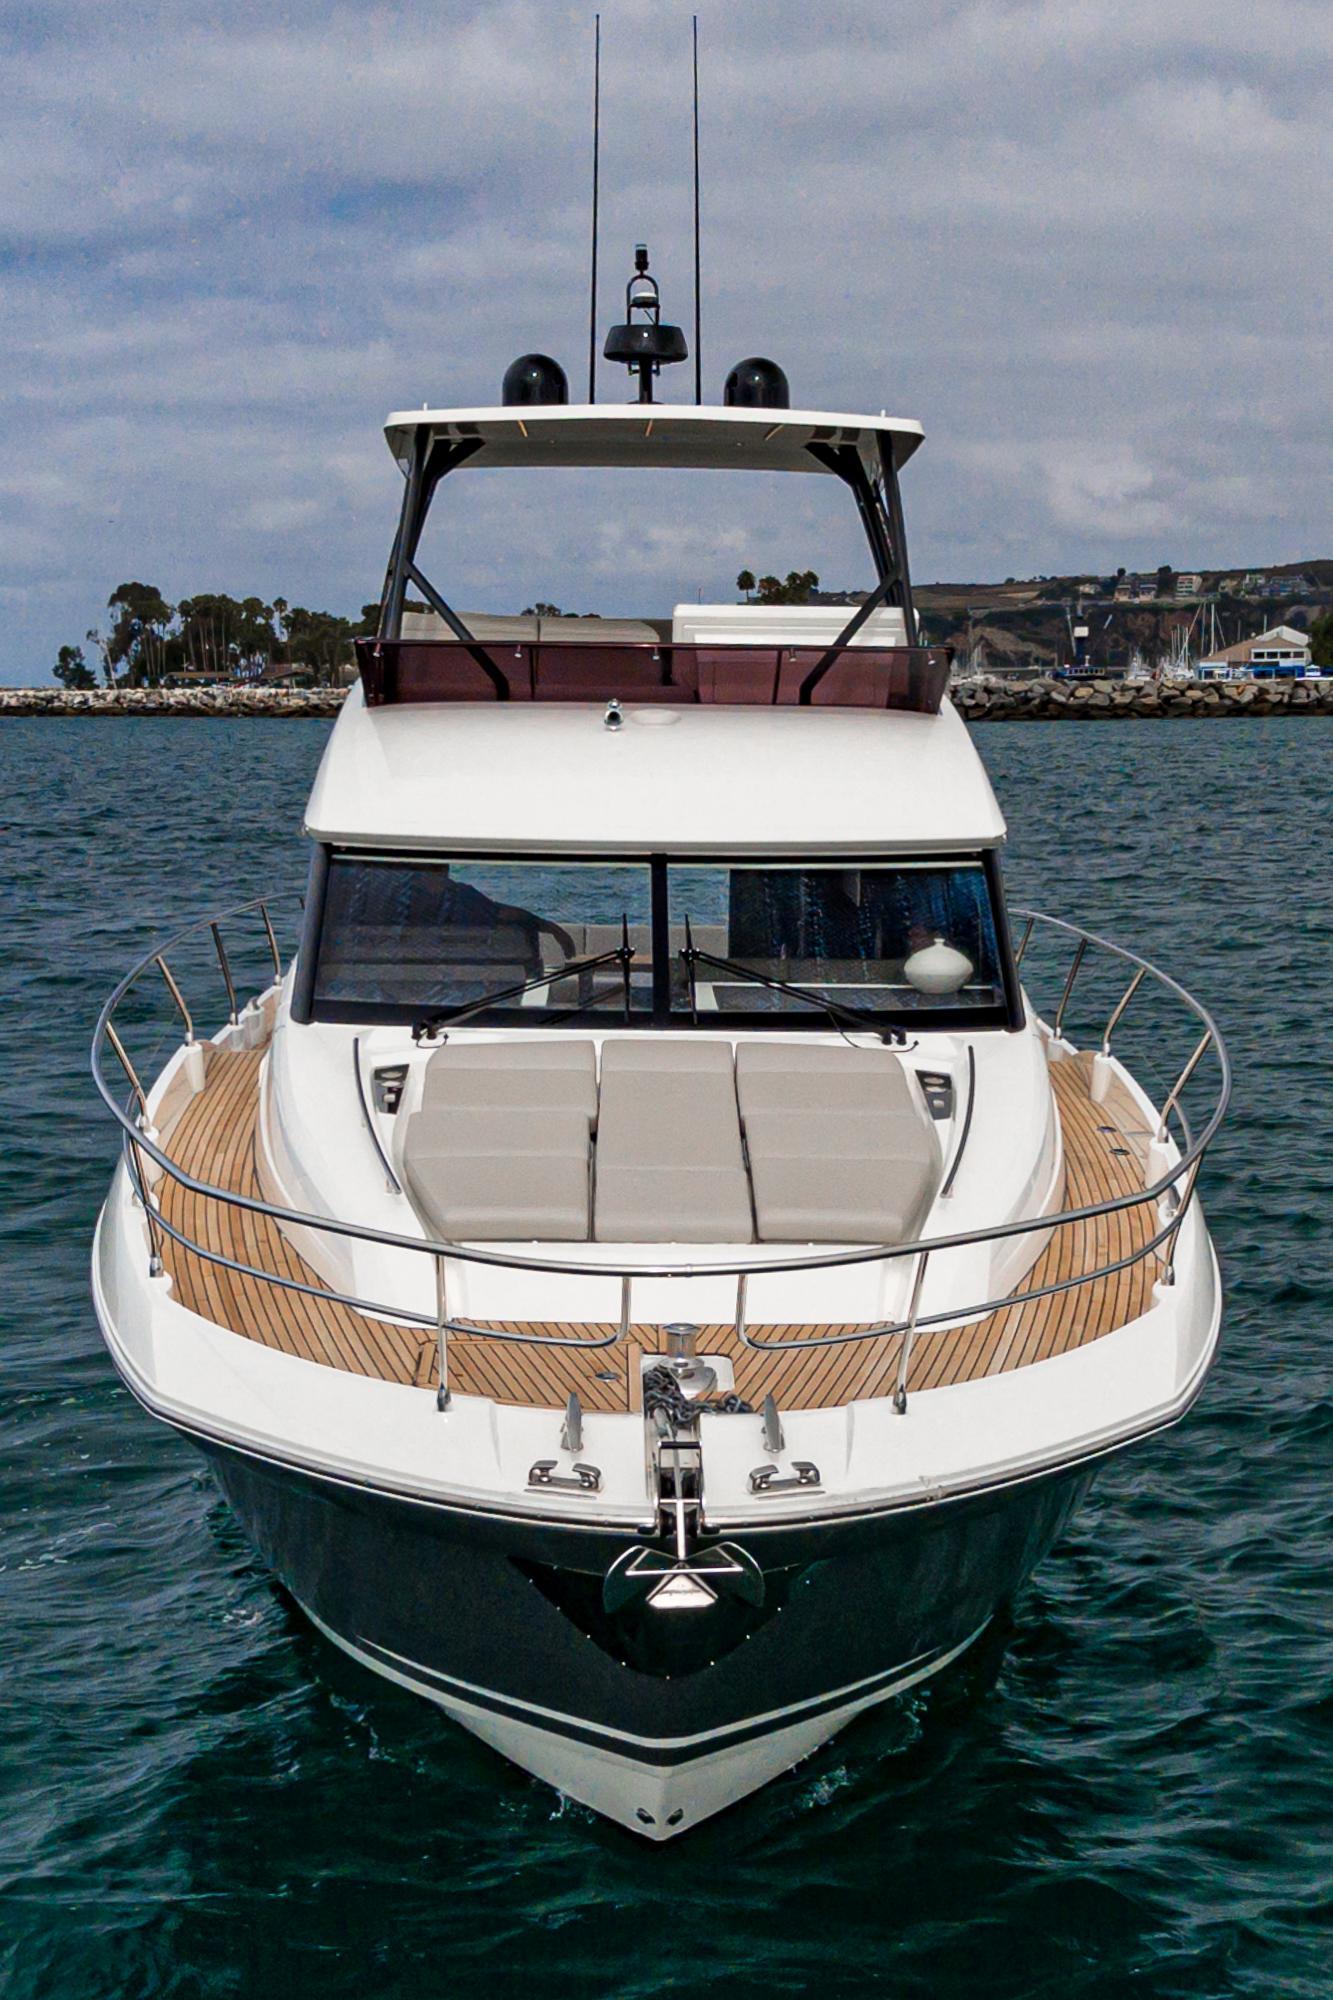 2021 Prestige 520 Fly #PR134F inventory image at Sun Country Coastal in Newport Beach